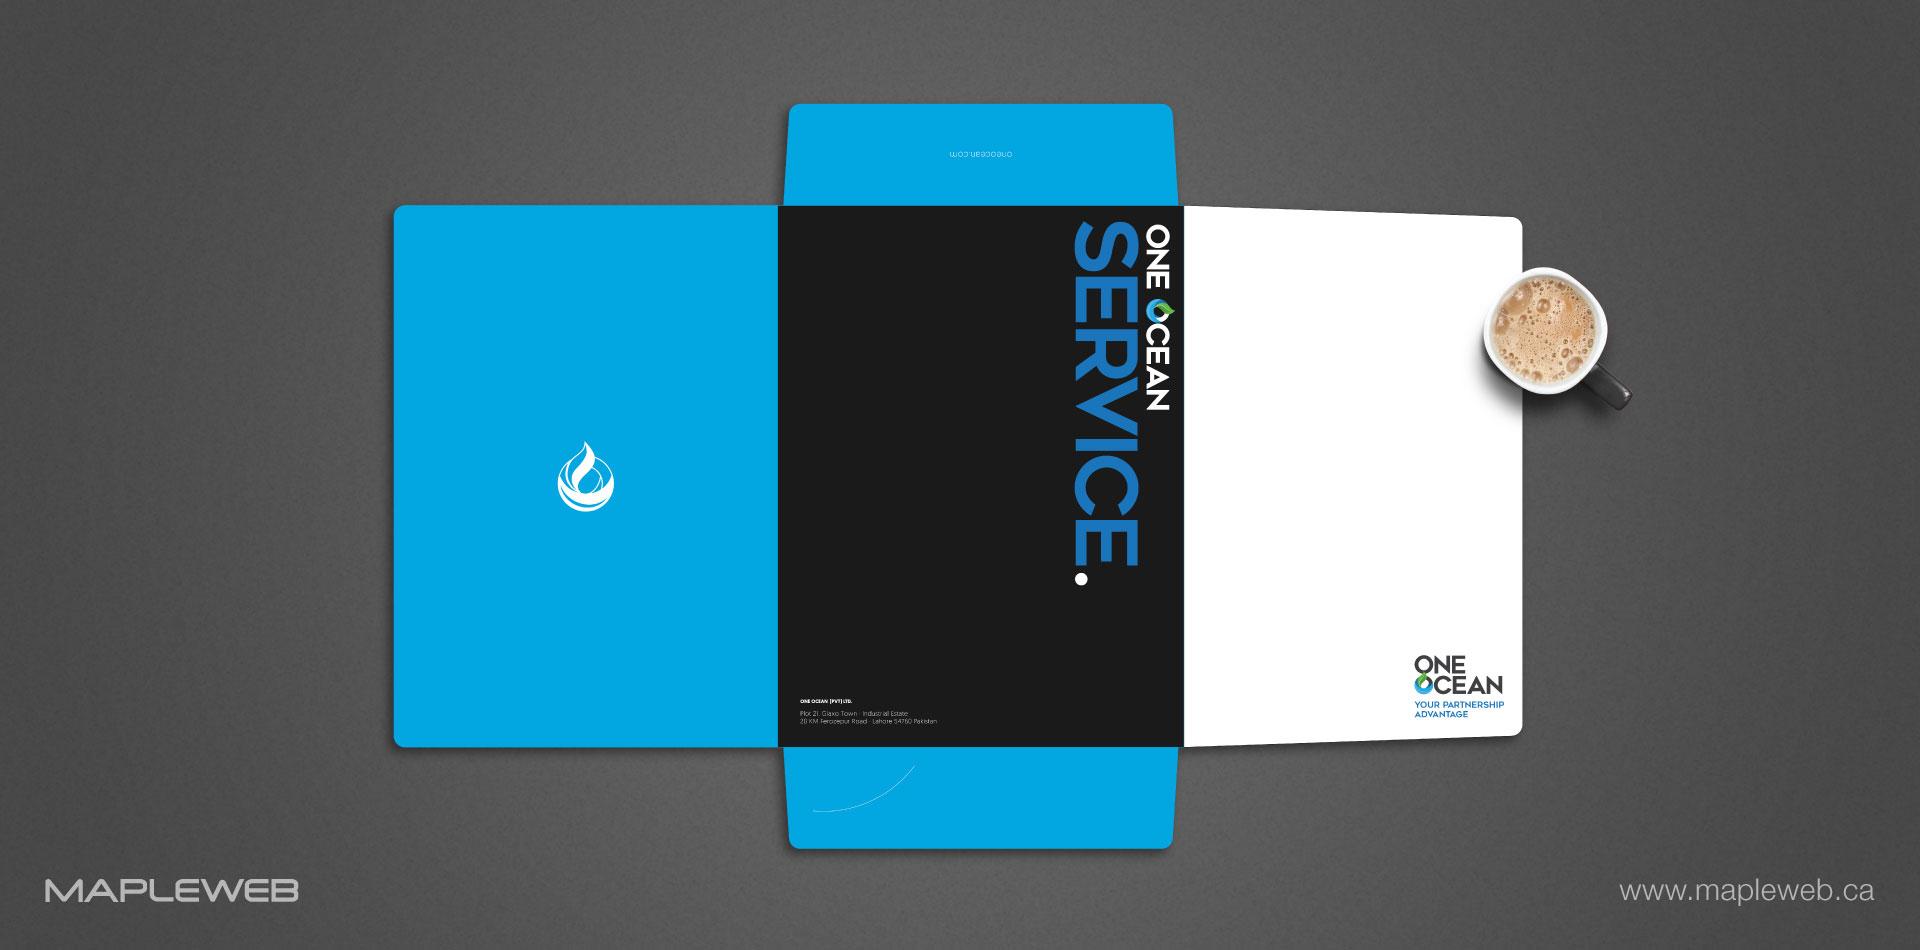 one-ocean-brand-logo-design-by-mapleweb-vancouver-canada-folder-mock